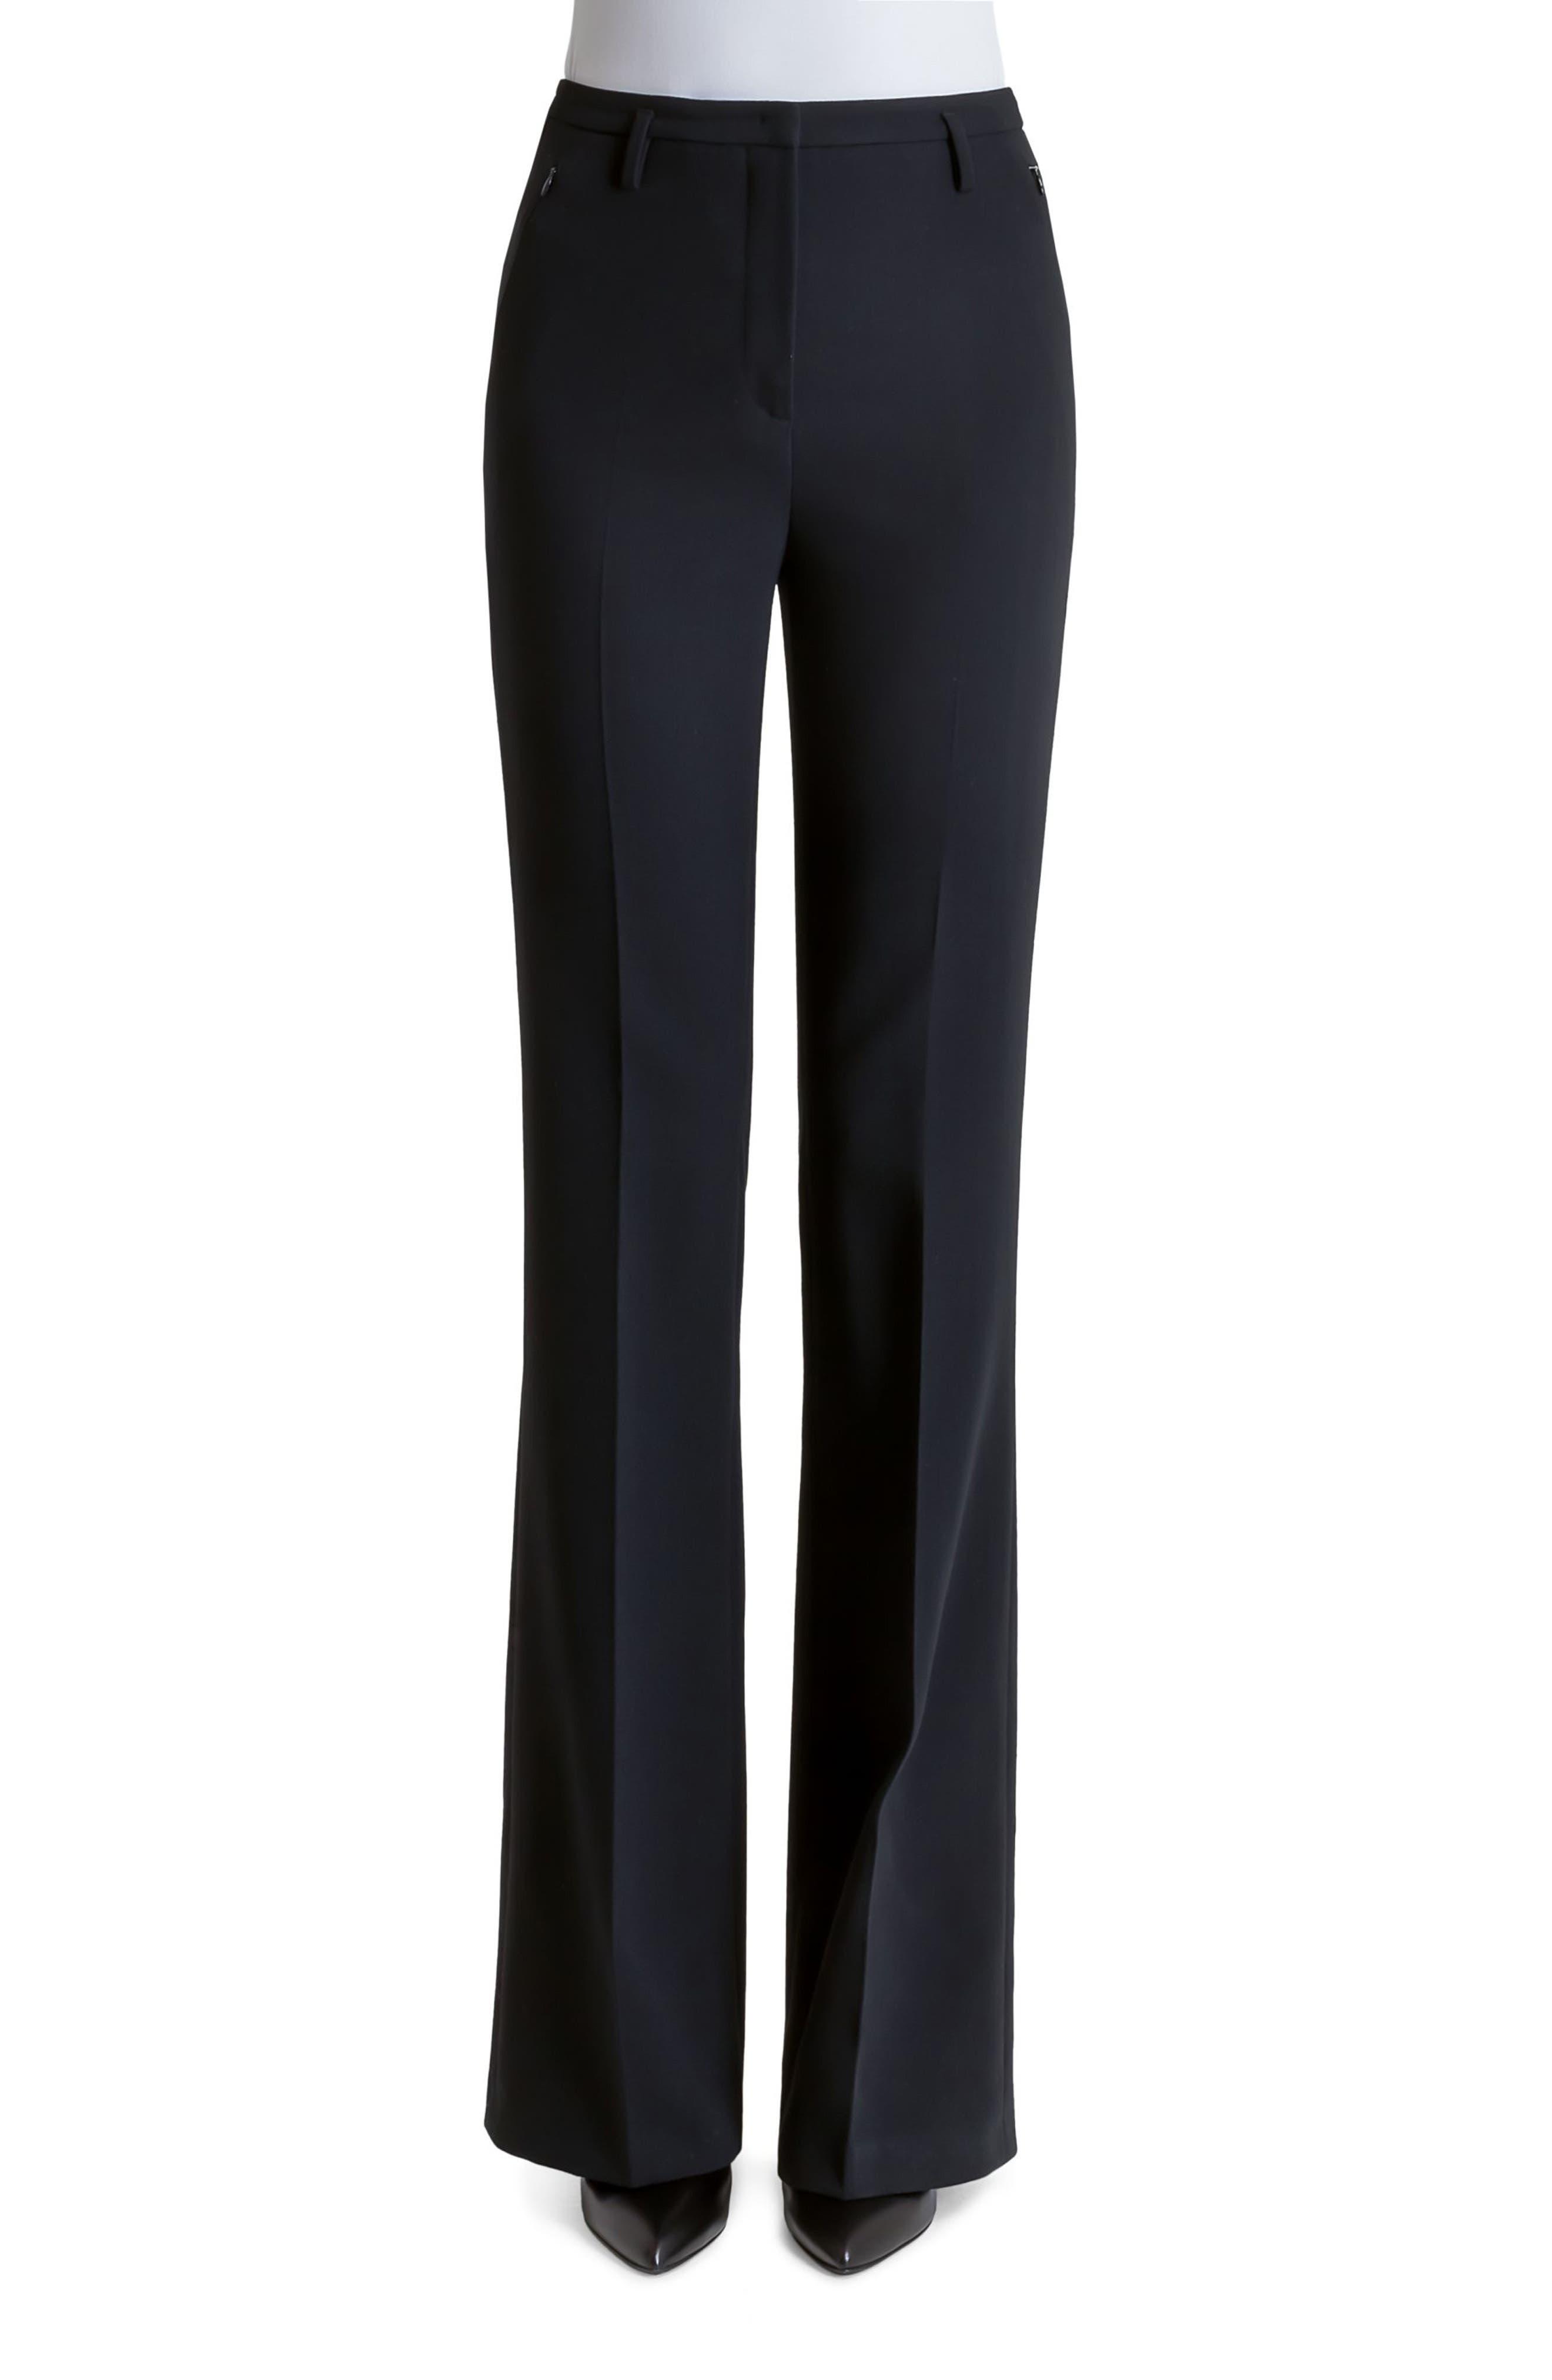 Farrah Stretch Wool Flare Pants,                             Alternate thumbnail 8, color,                             BLACK